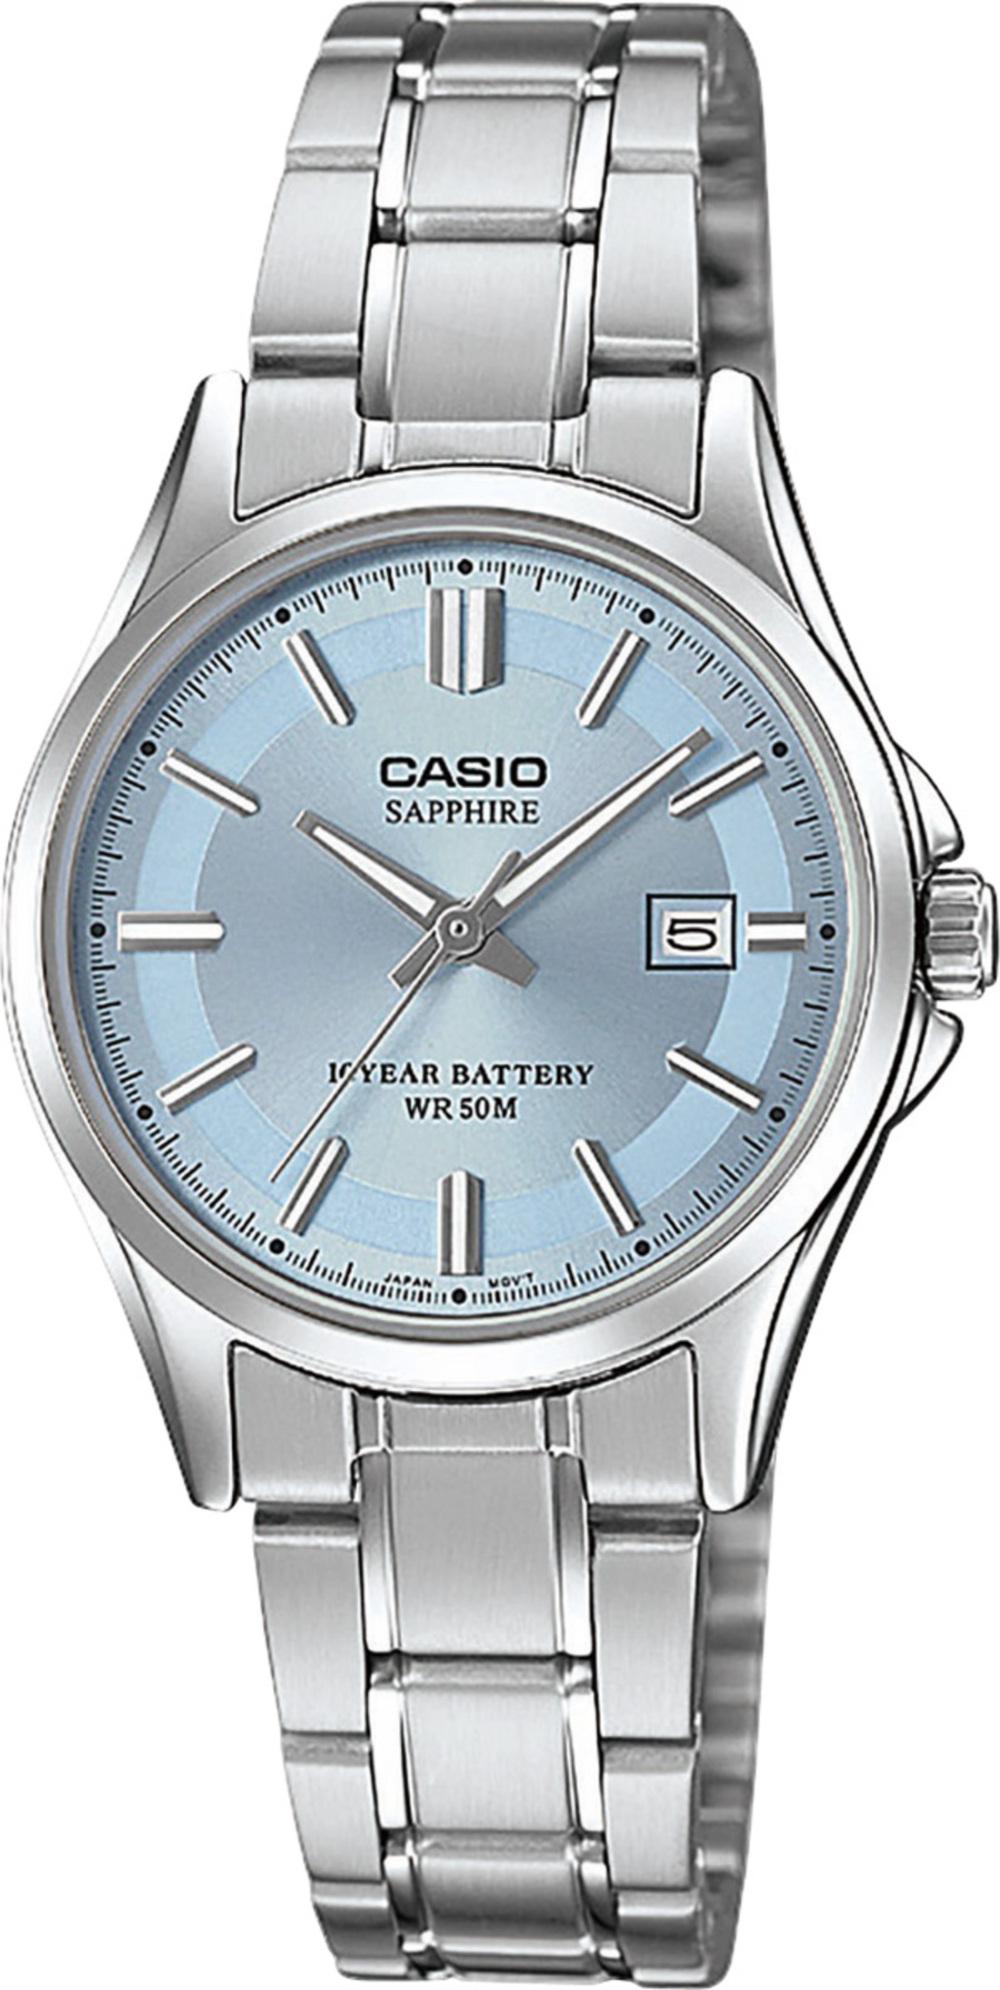 CASIO Damenuhr LTS-100D-2A1VEF Saphirglas Datum